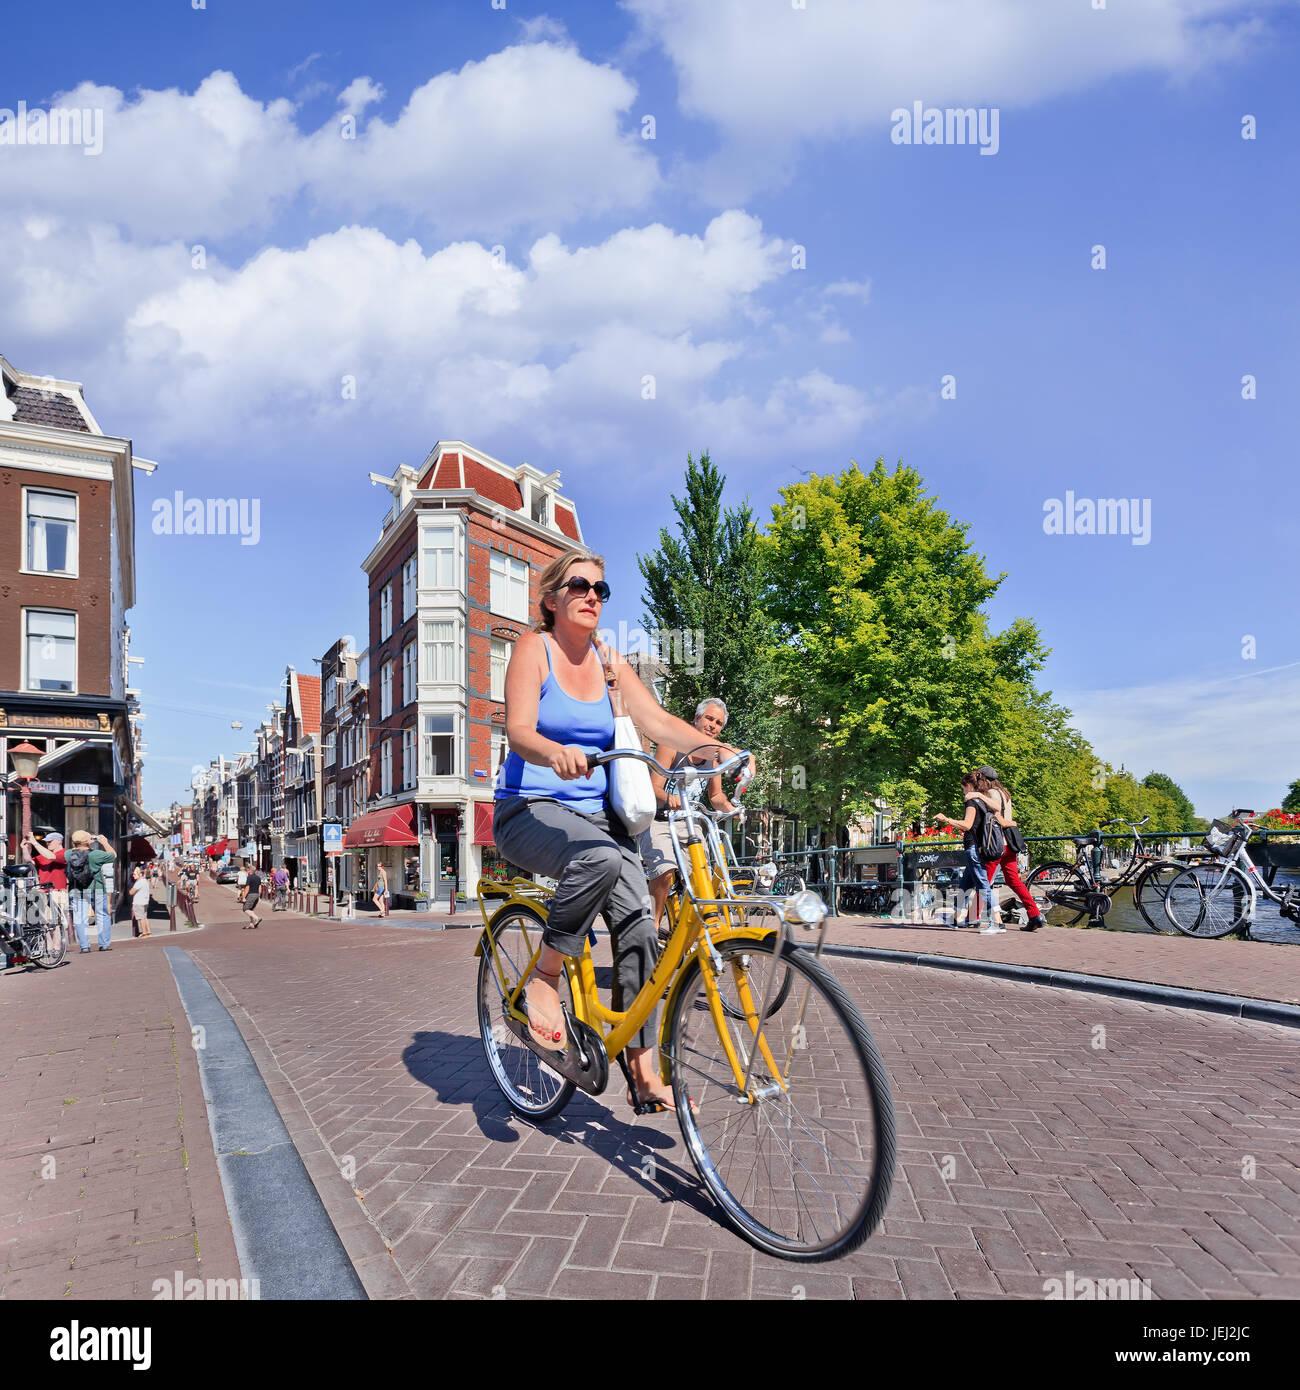 Best Way Rentals: Amsterdam Bike Rental Stock Photos & Amsterdam Bike Rental